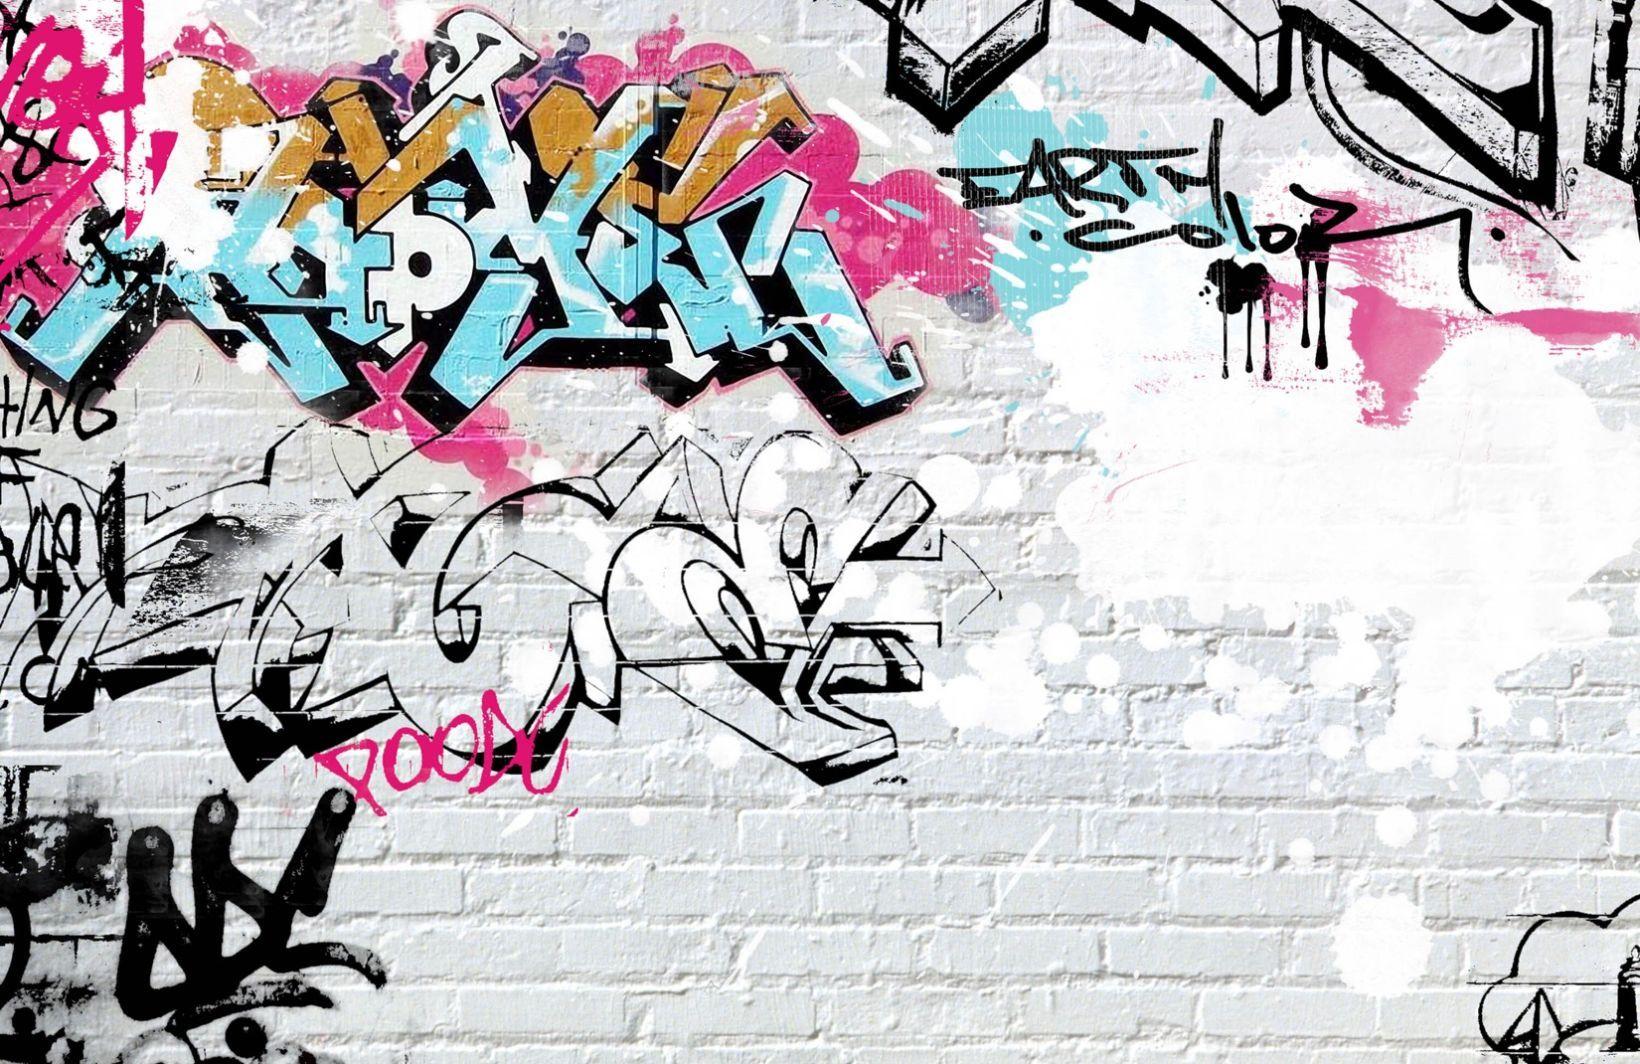 Граффити картинка для презентации